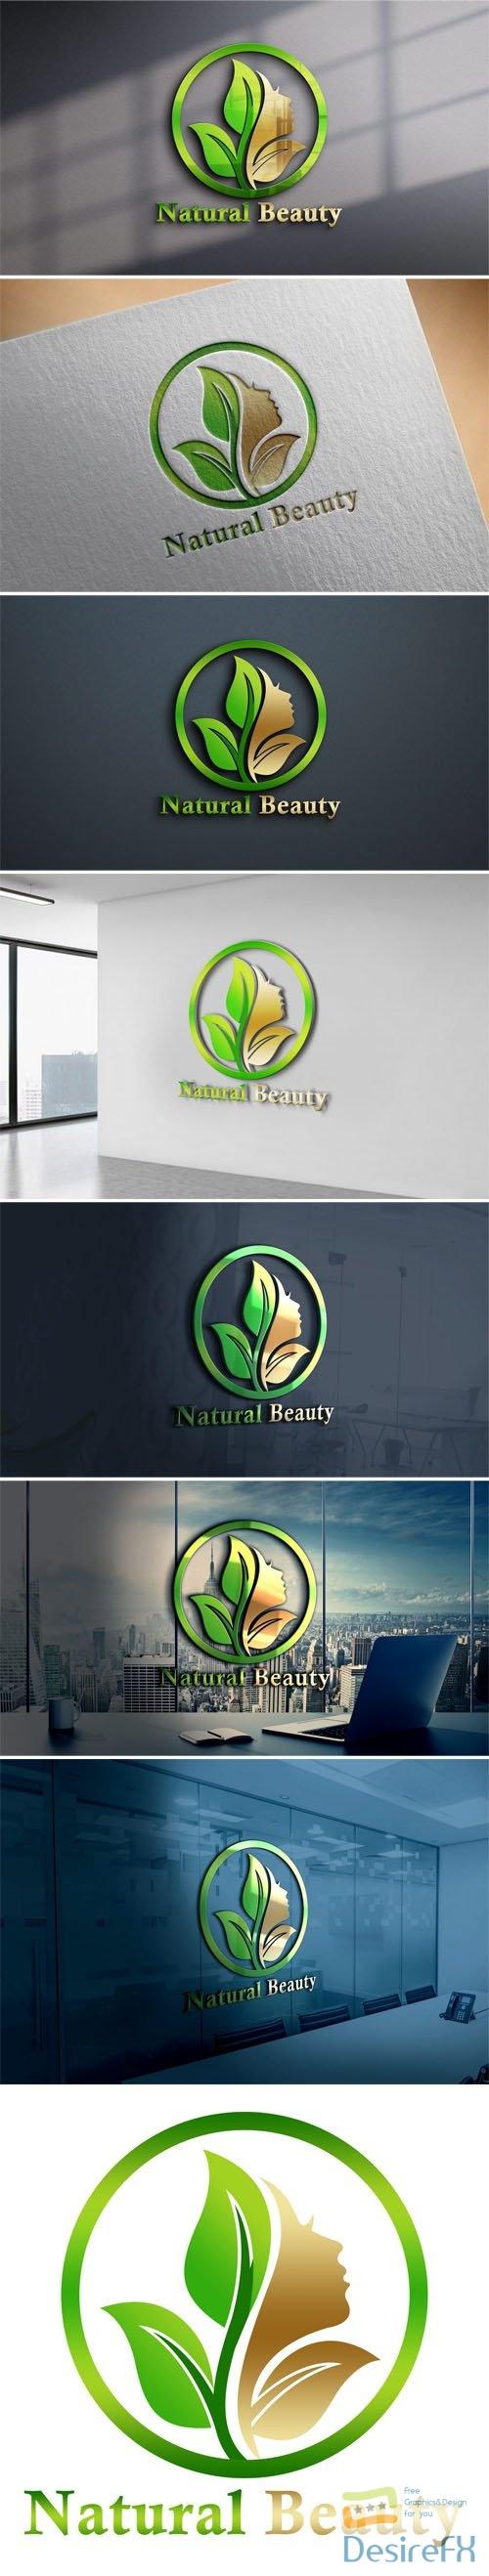 Natural Beauty Logo PSD Design Template